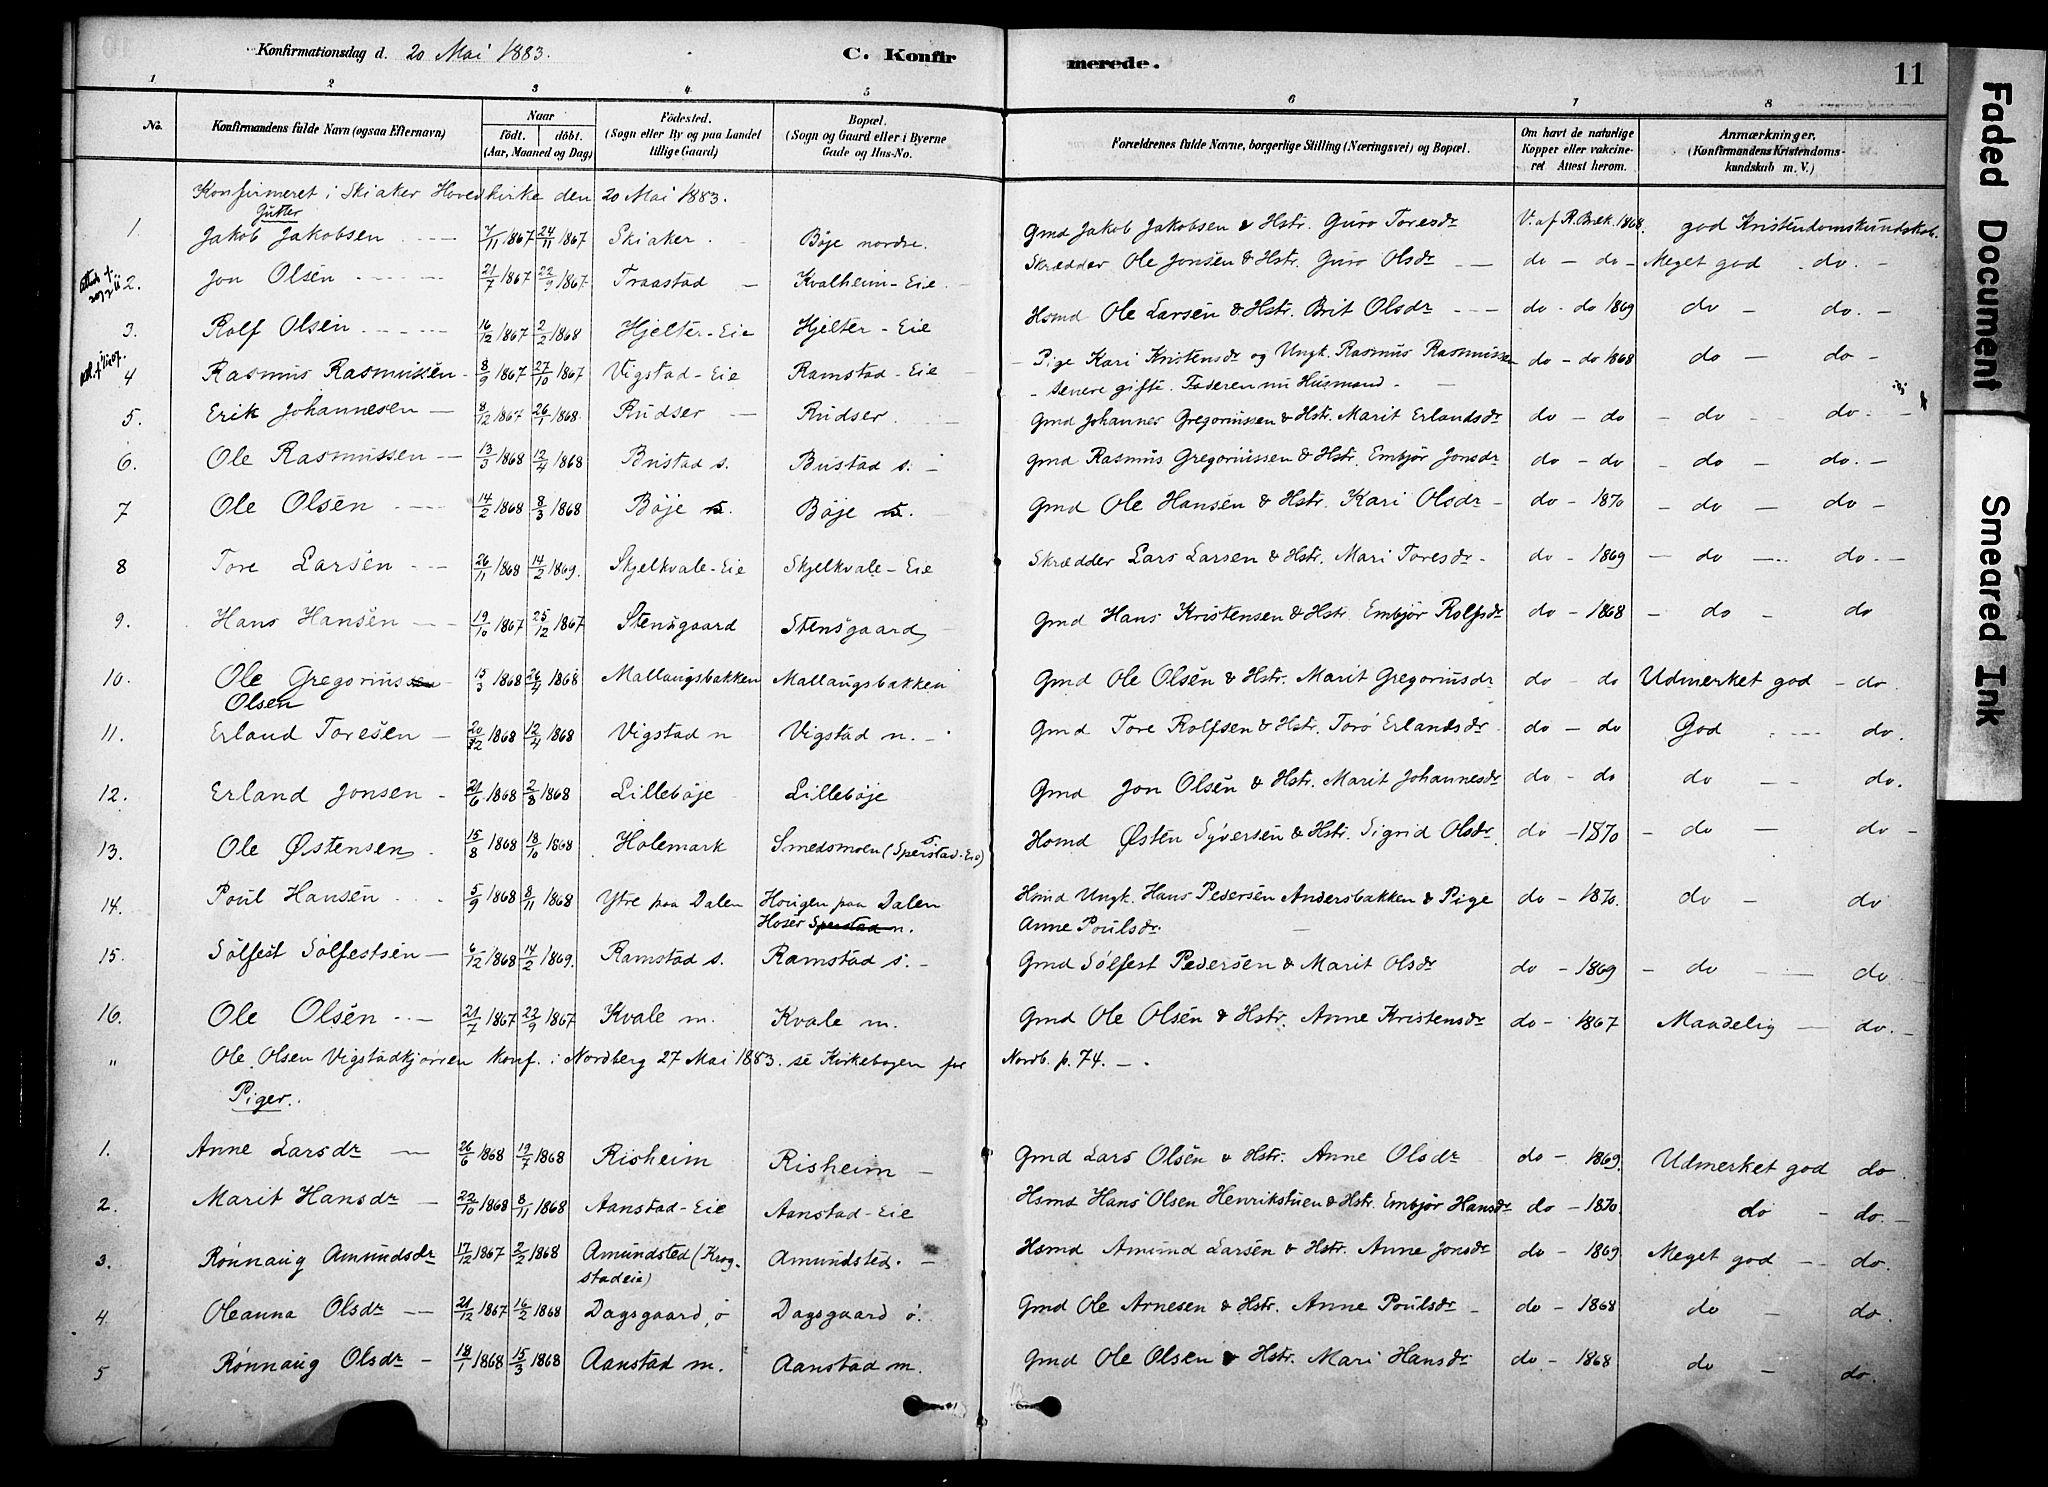 SAH, Skjåk prestekontor, Ministerialbok nr. 2, 1878-1907, s. 11